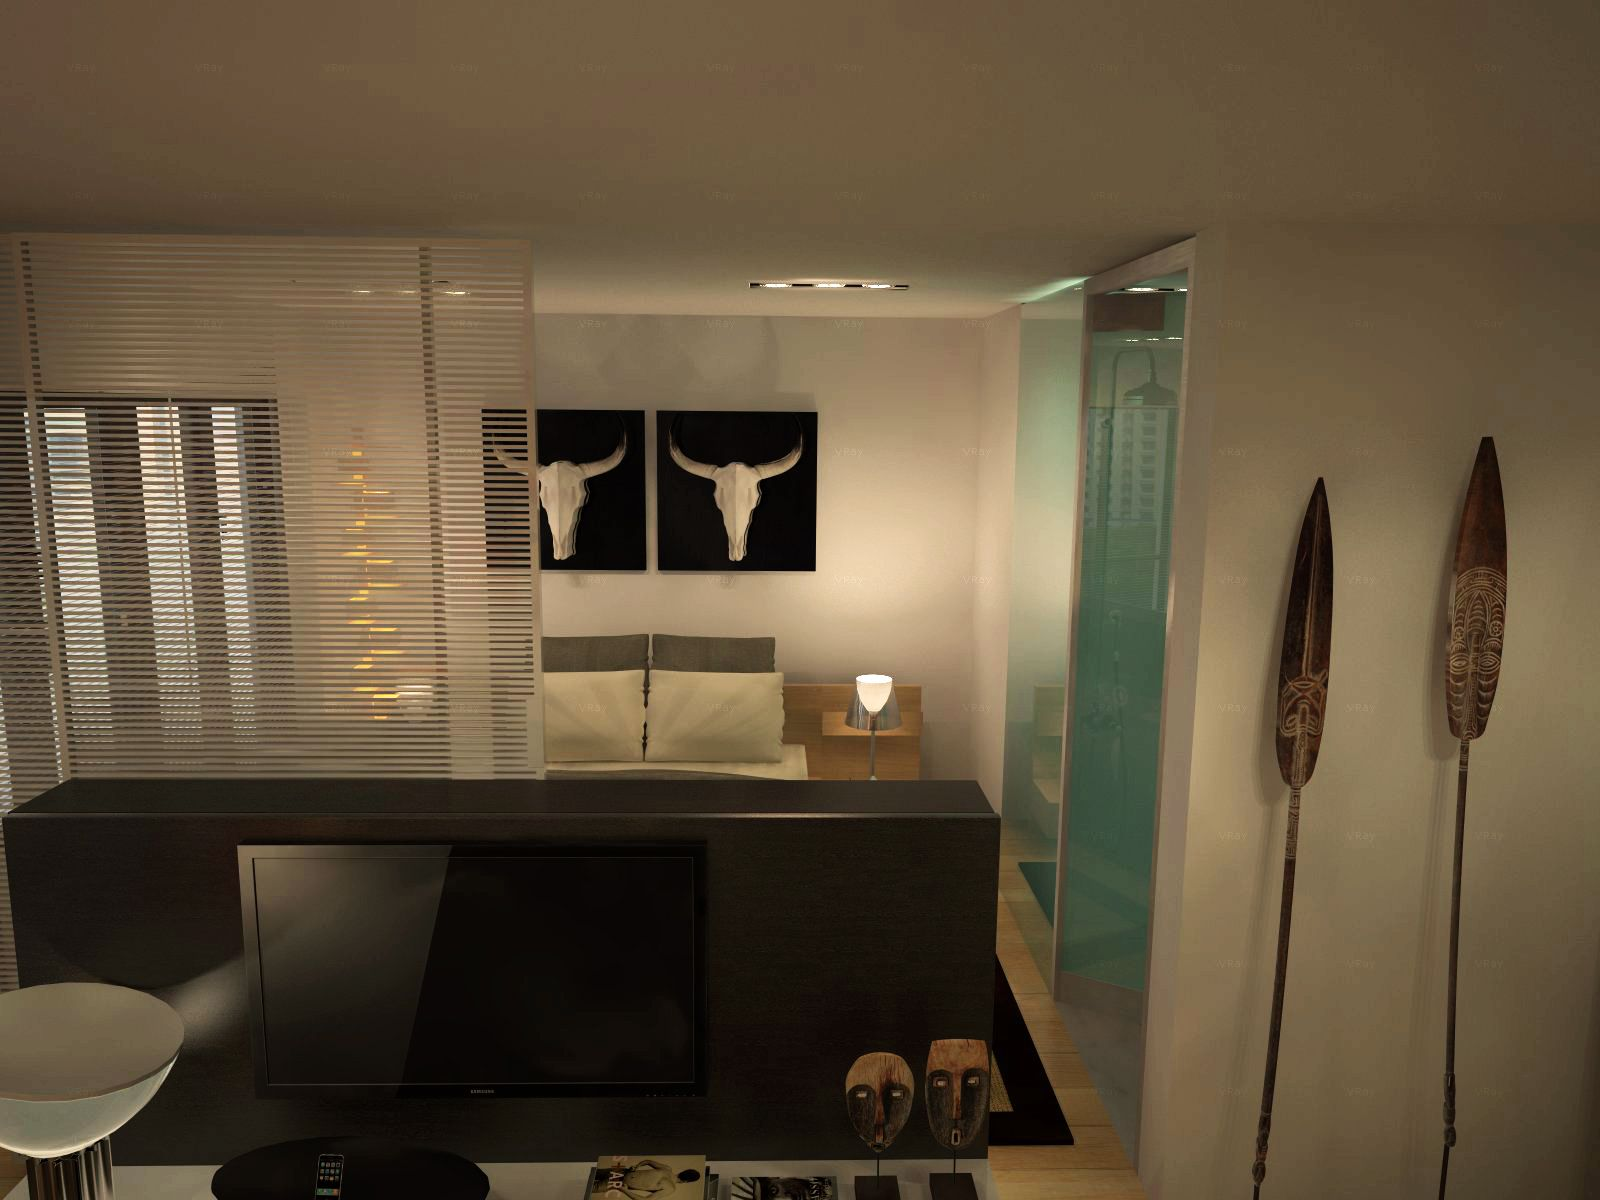 Studio Apartment Hdb another hdb 2 room bto at sengkang fernvale lea also design